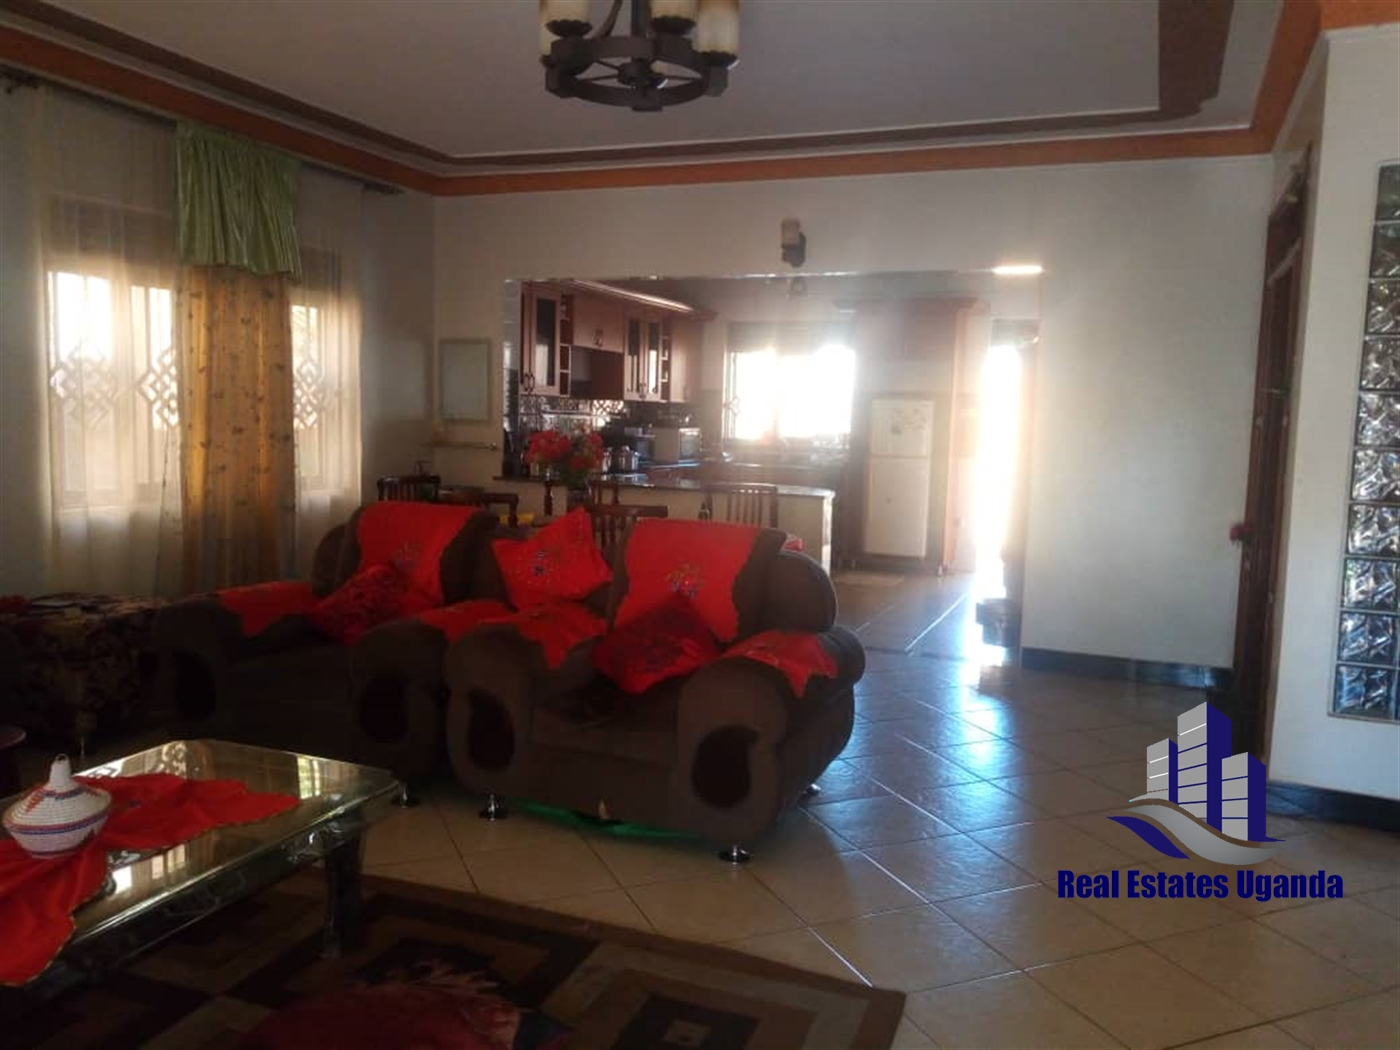 Bungalow for sale in Munyonyo Wakiso